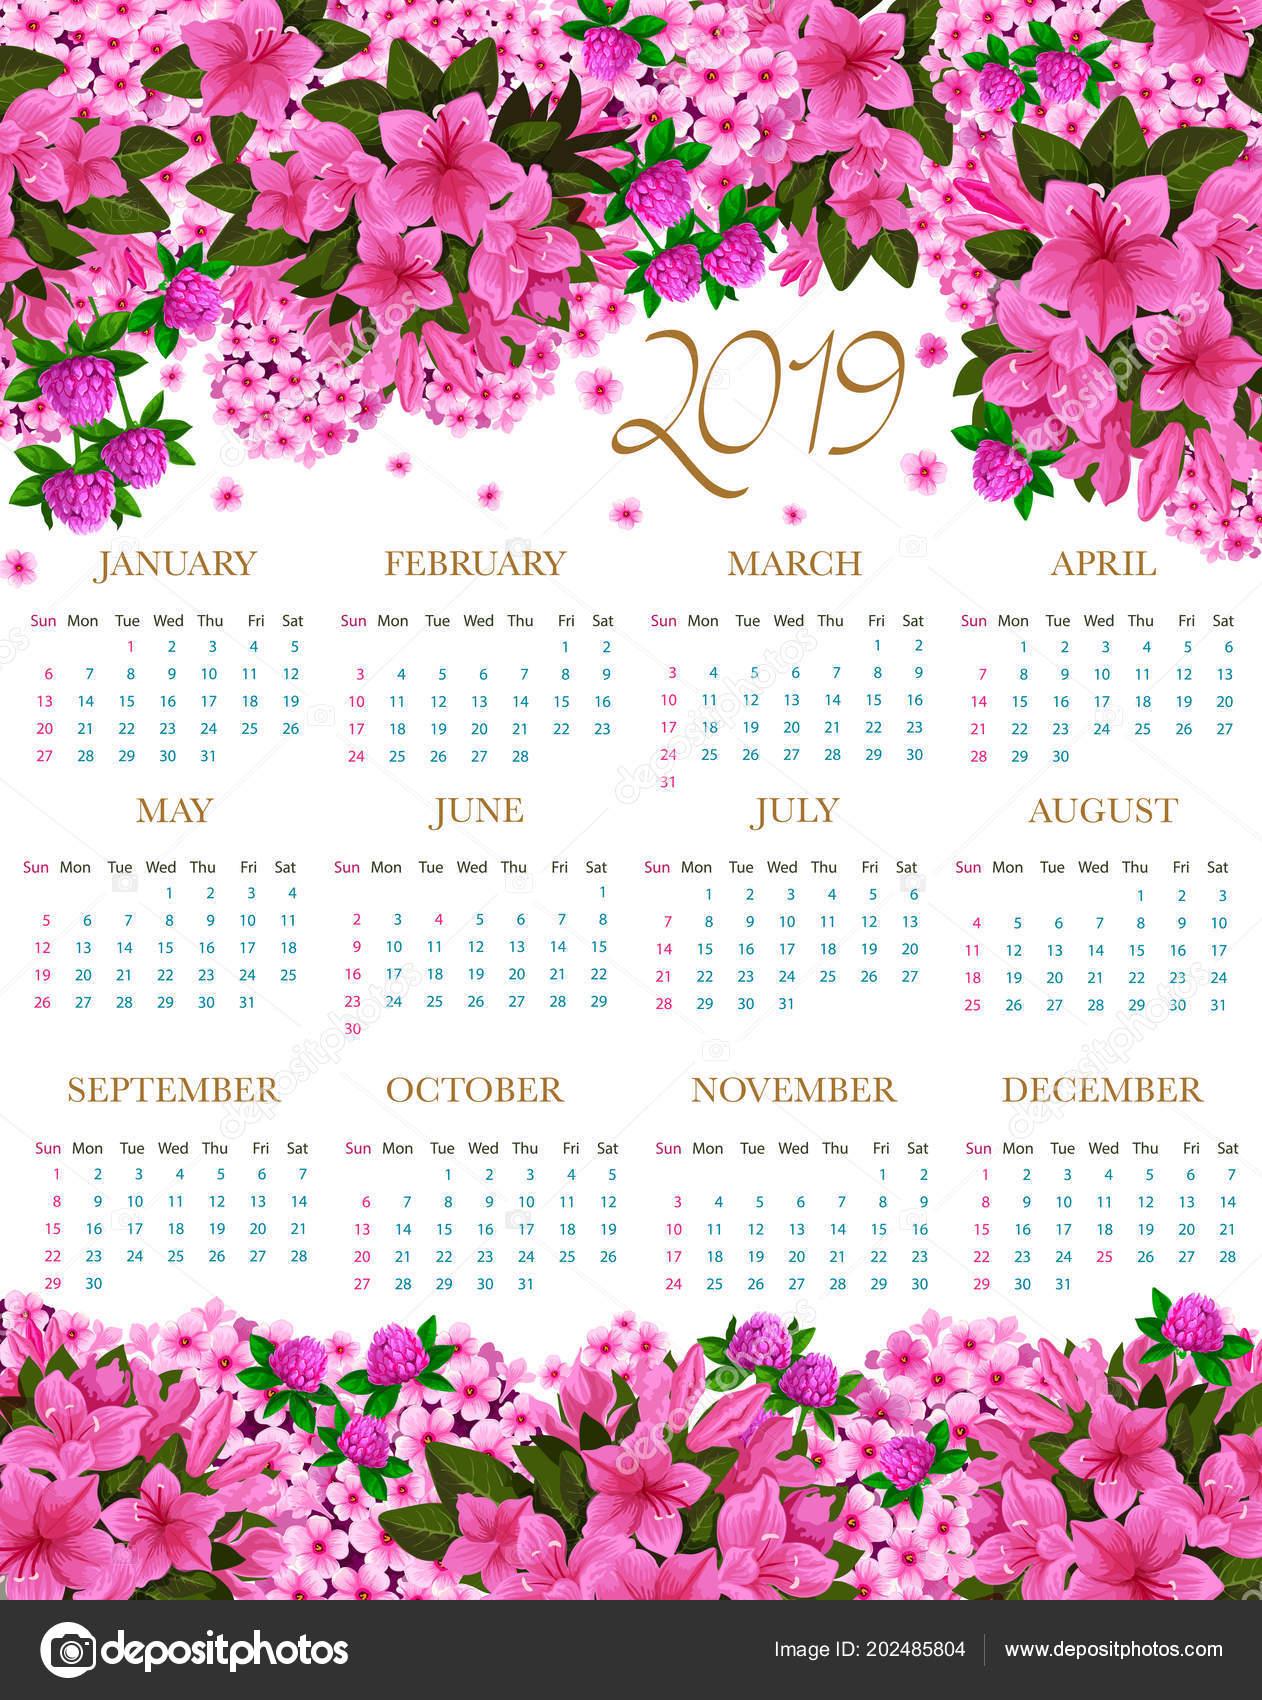 Calendario 2019 Rosa Portugues.Calendario 2019 Vector De Flores De Primavera Rosa Archivo